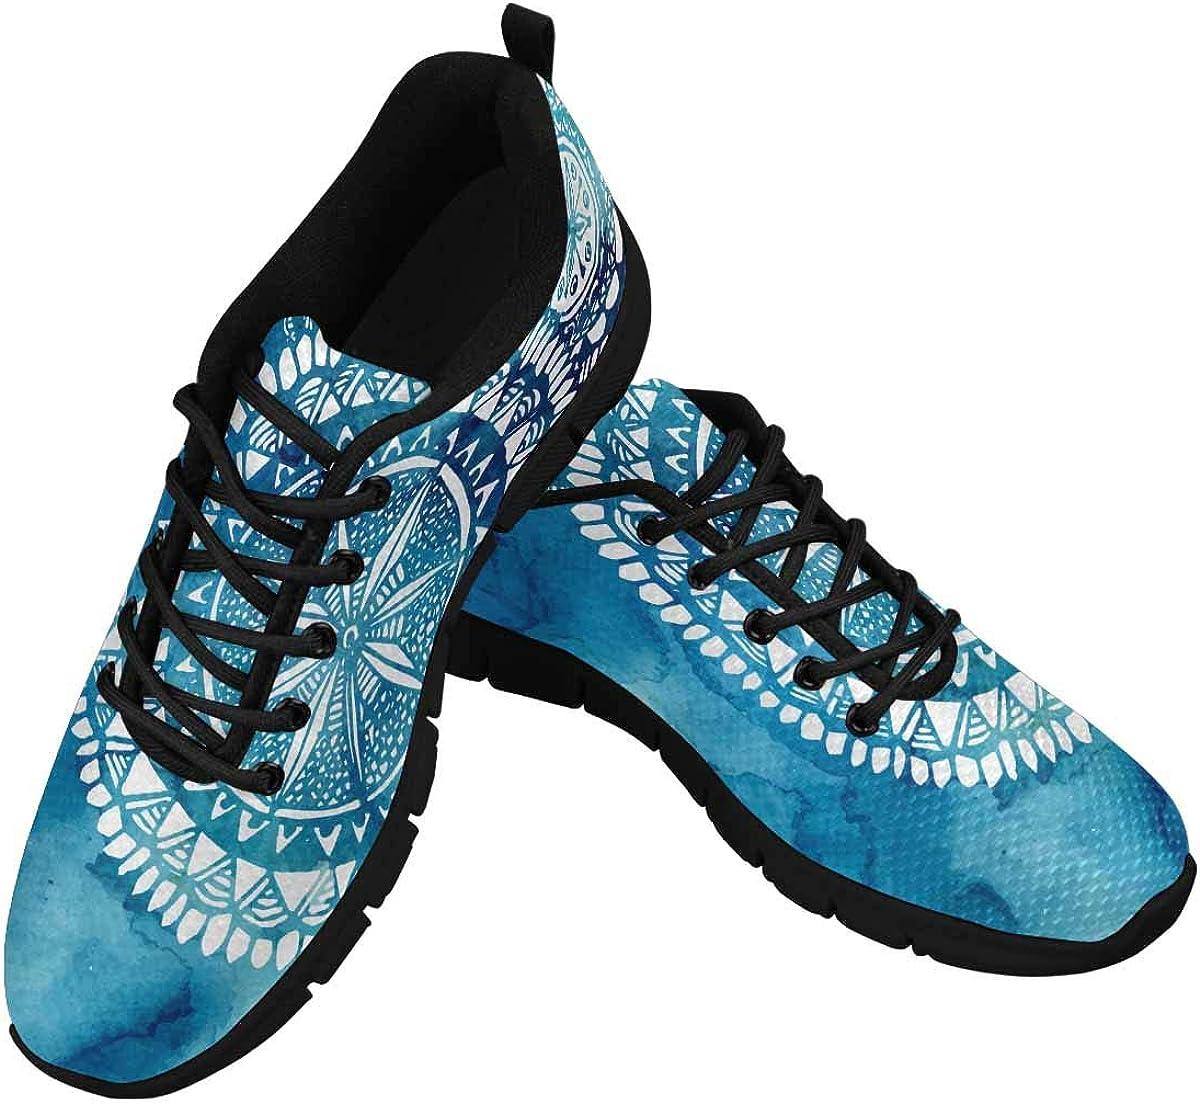 InterestPrint Blue Watercolor Brush Wash Women's Tennis Running Shoes Lightweight Sneakers